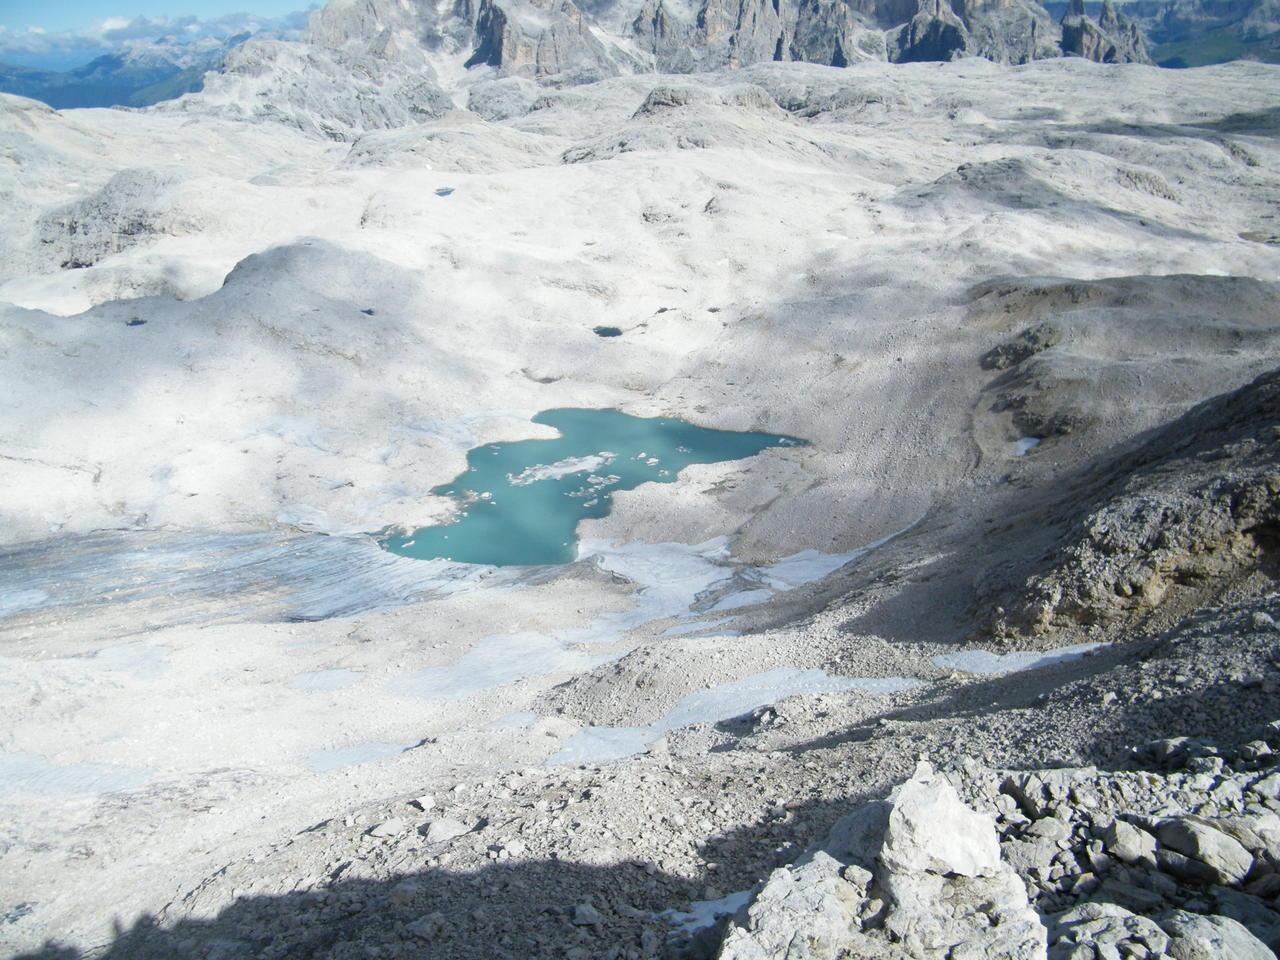 ghiacciaio della fradusta-dscf6392.jpg